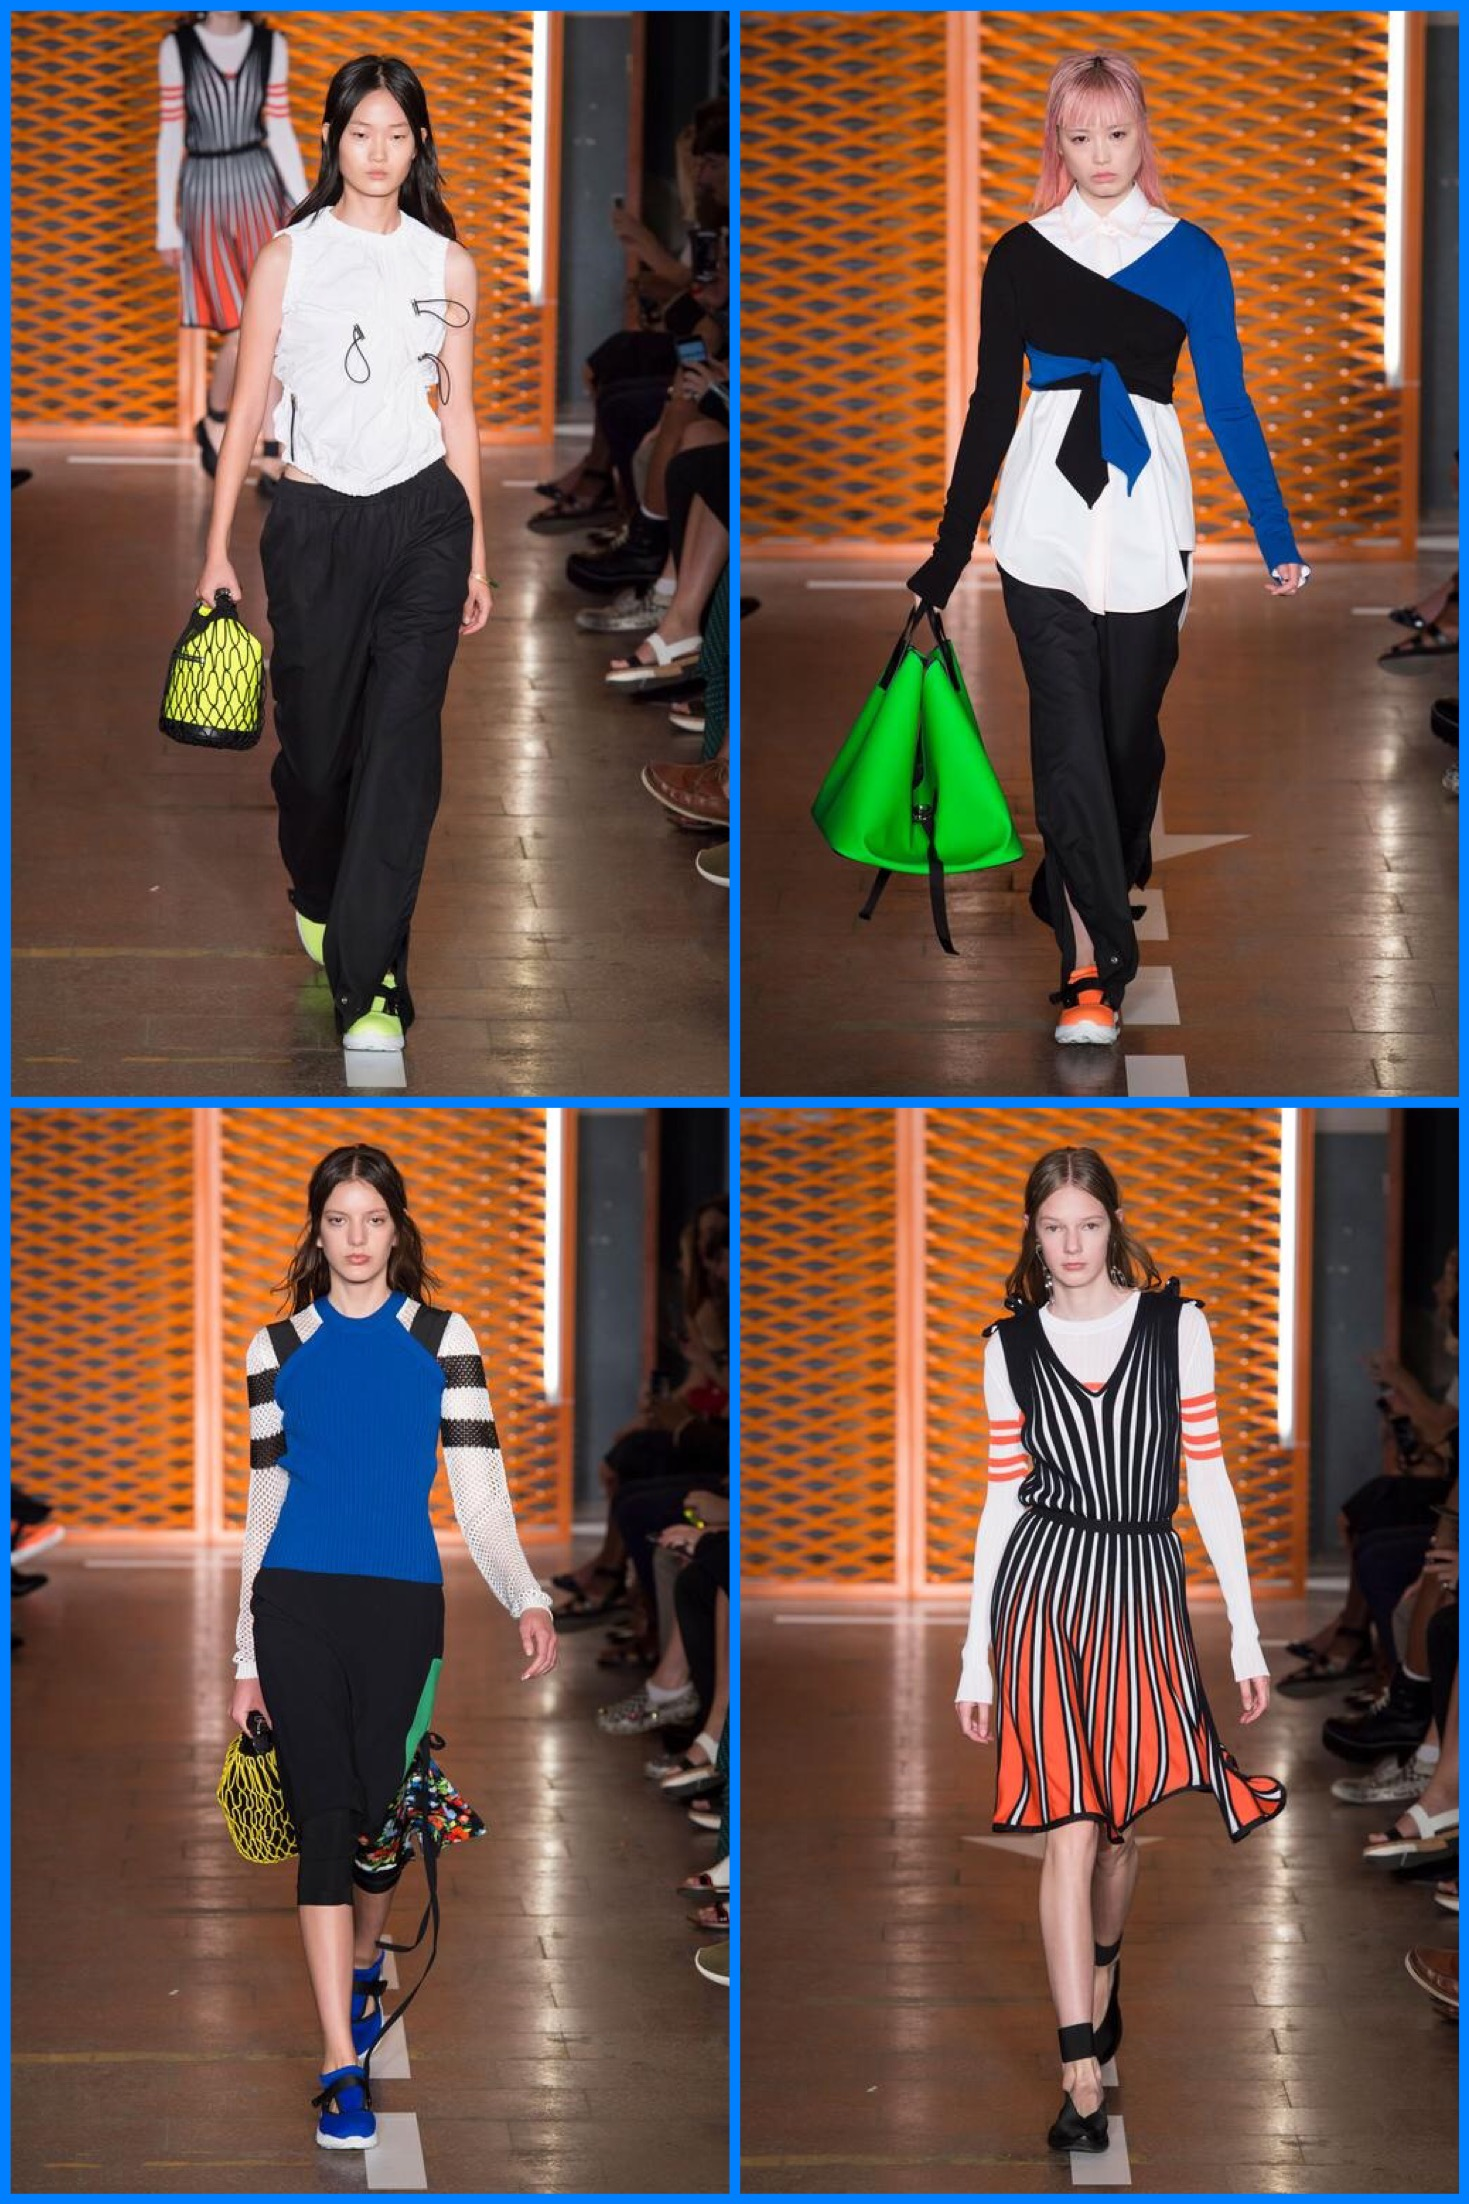 milano-fashion-week-pret-a-porter-spring-summer-2017-style-msgm